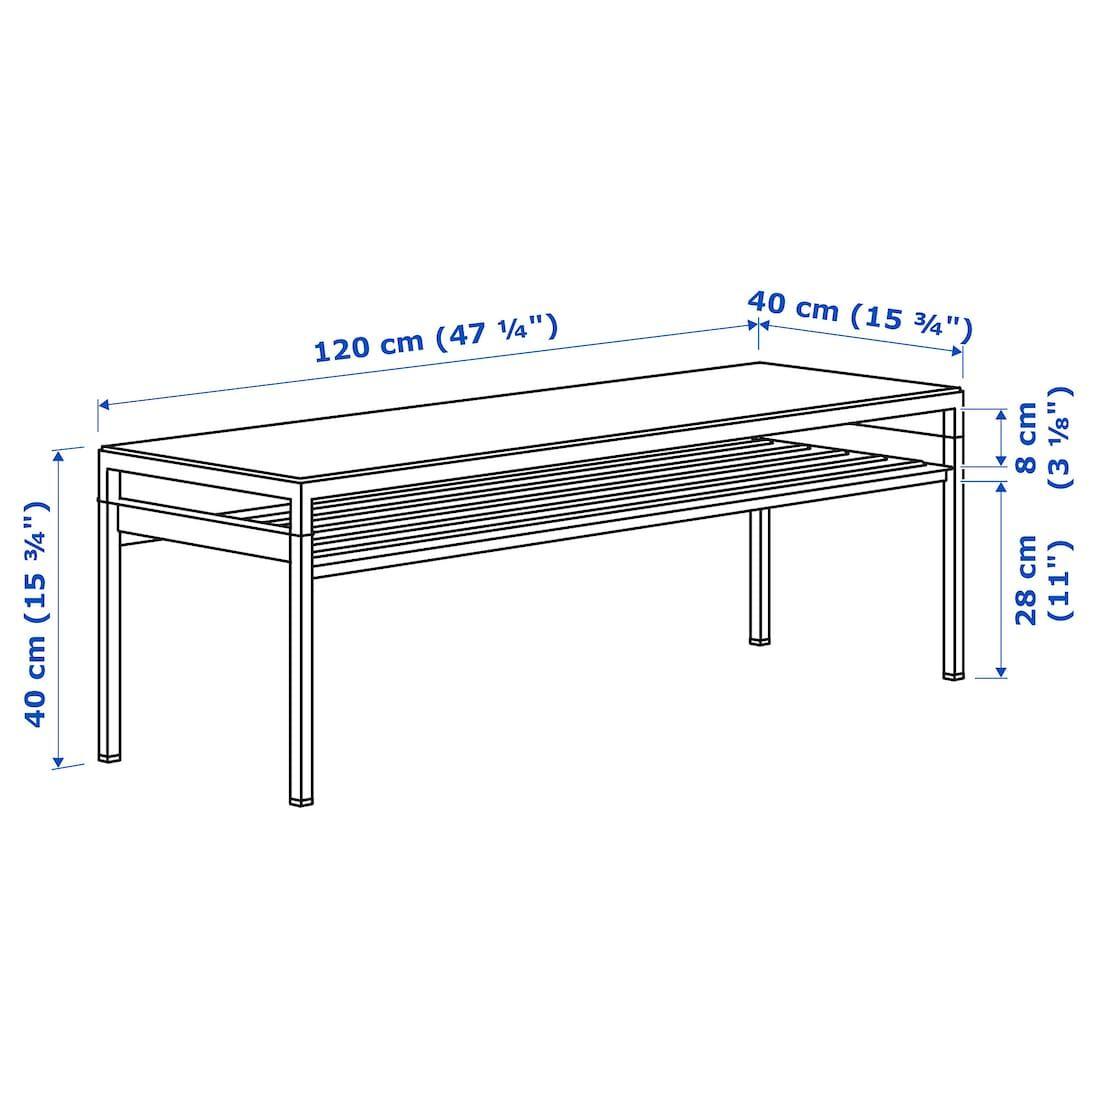 Nyboda Soffbord Med Vandbar Bordsskiva Morkgra Betongmonstrad Svart 120x40x40 Cm Ikea Table Top Table Top Lighting Ikea [ 1100 x 1100 Pixel ]